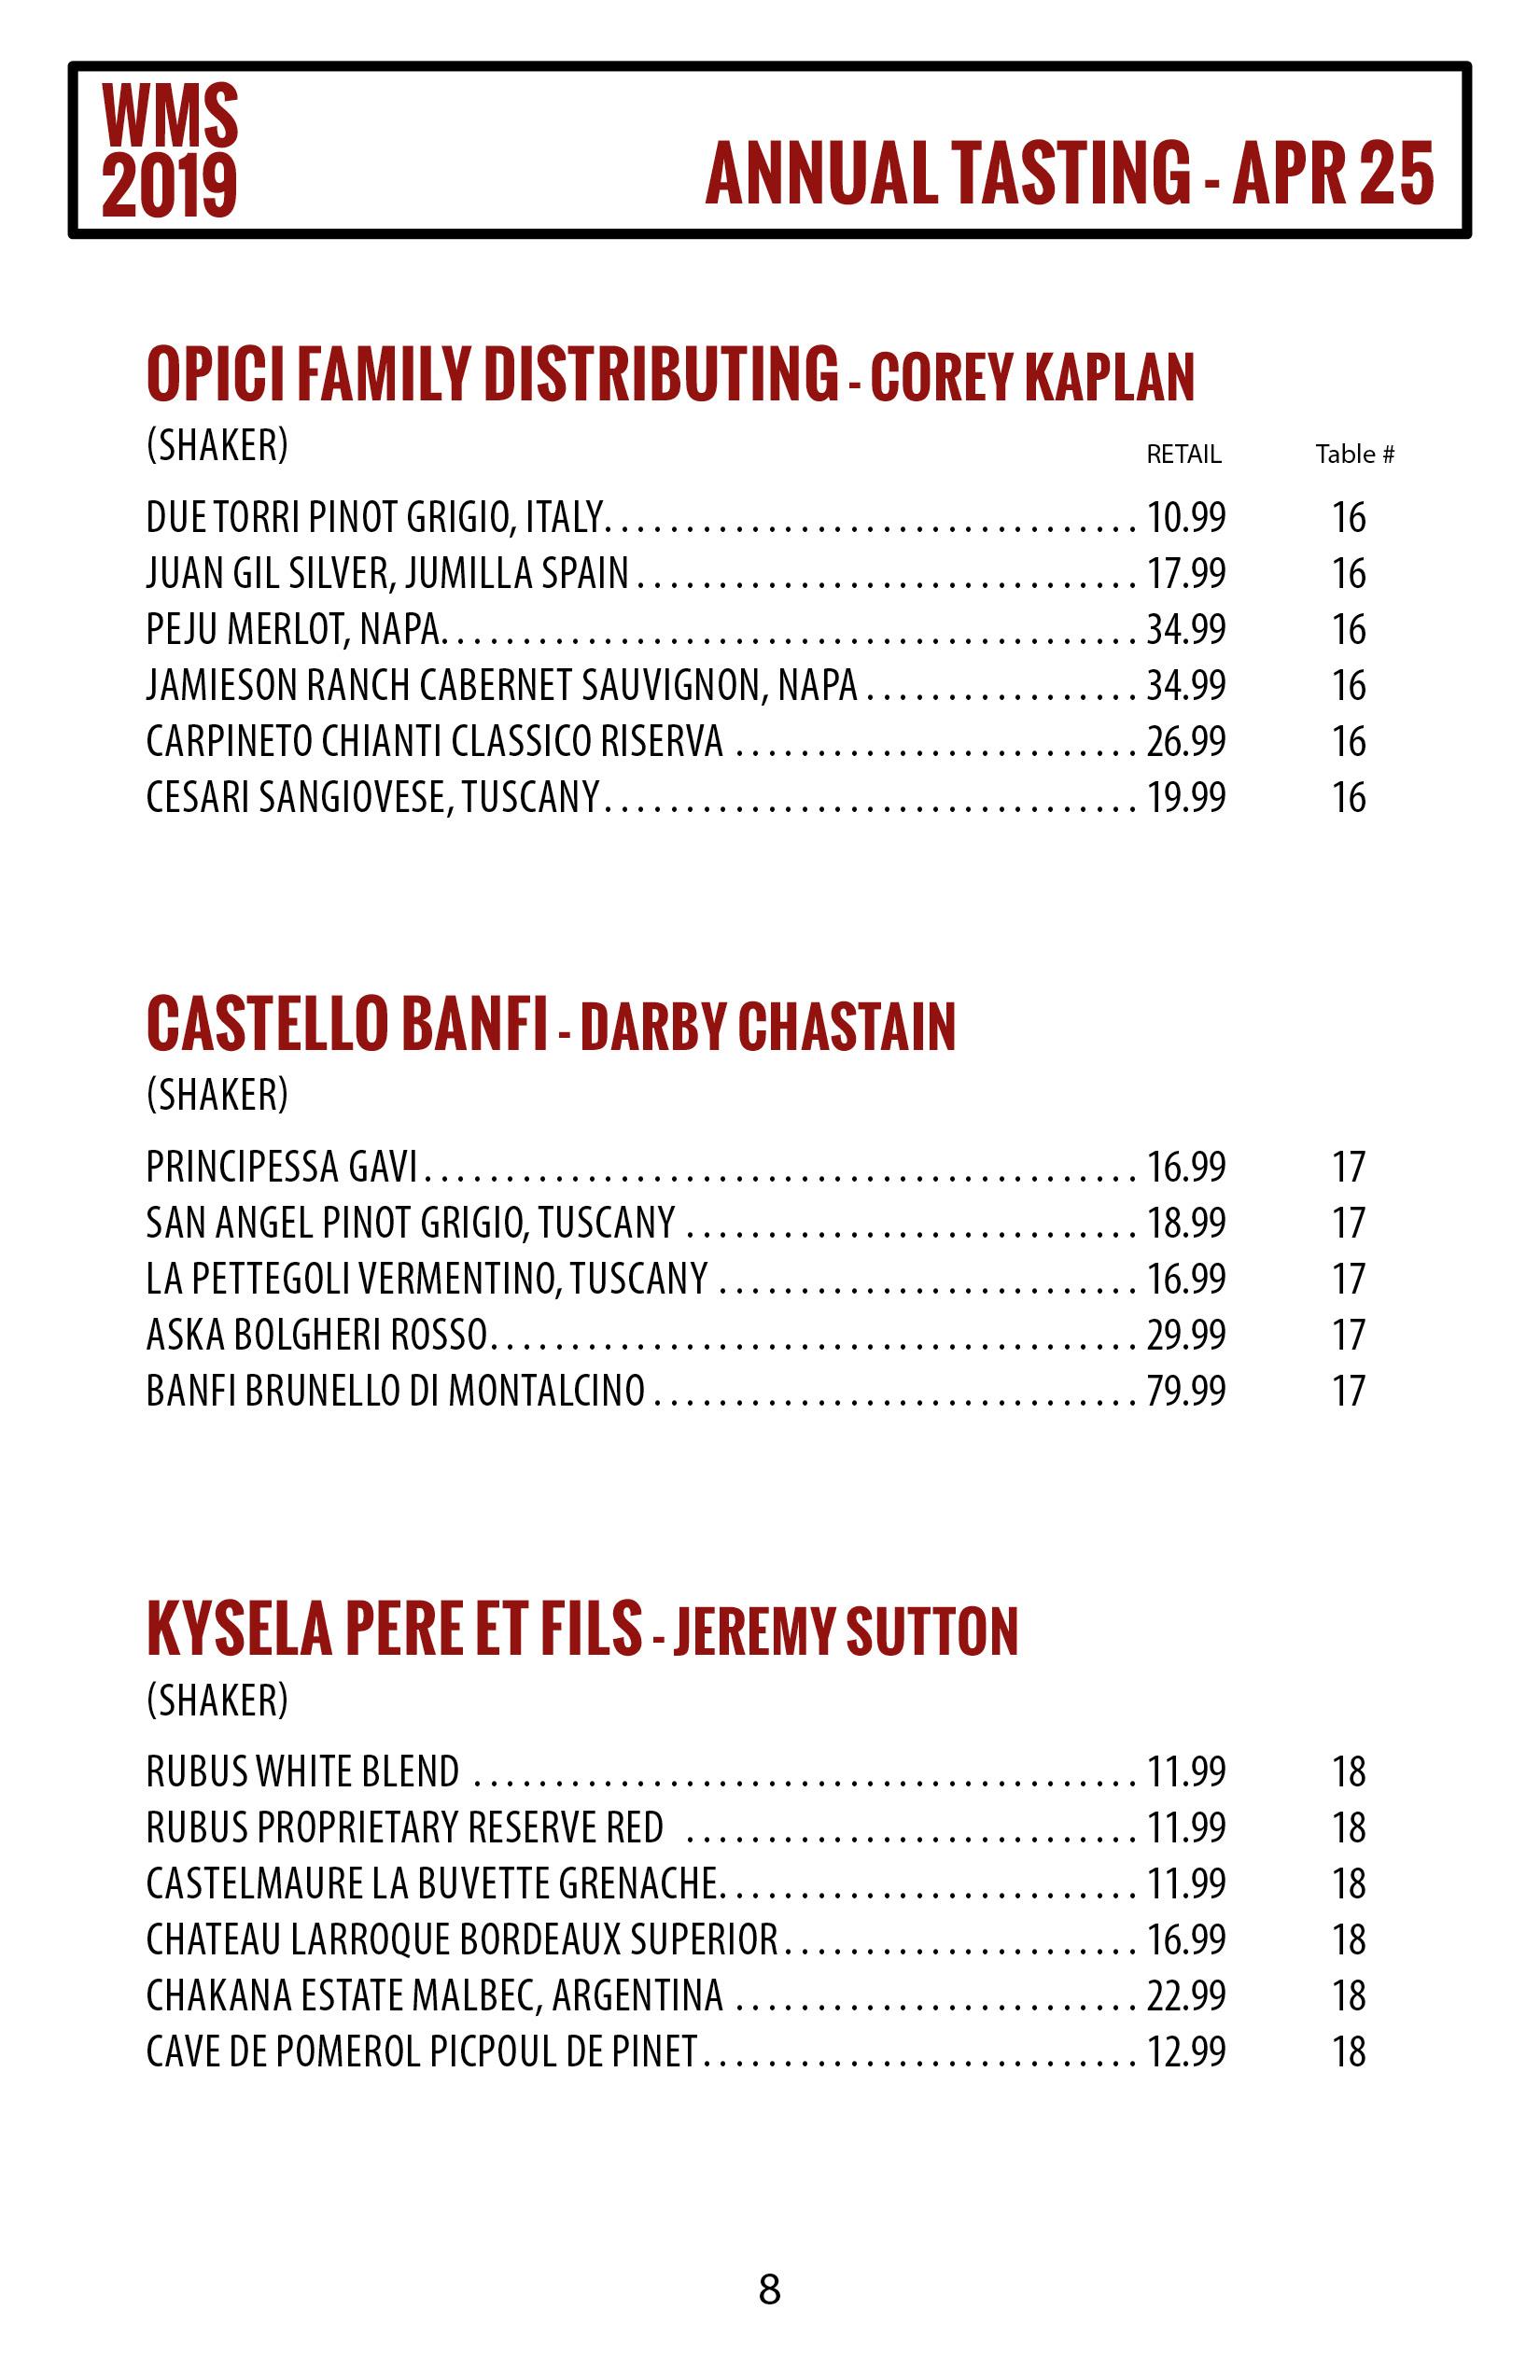 Winemakers and Shakers_Tasting Guide_20198.jpg